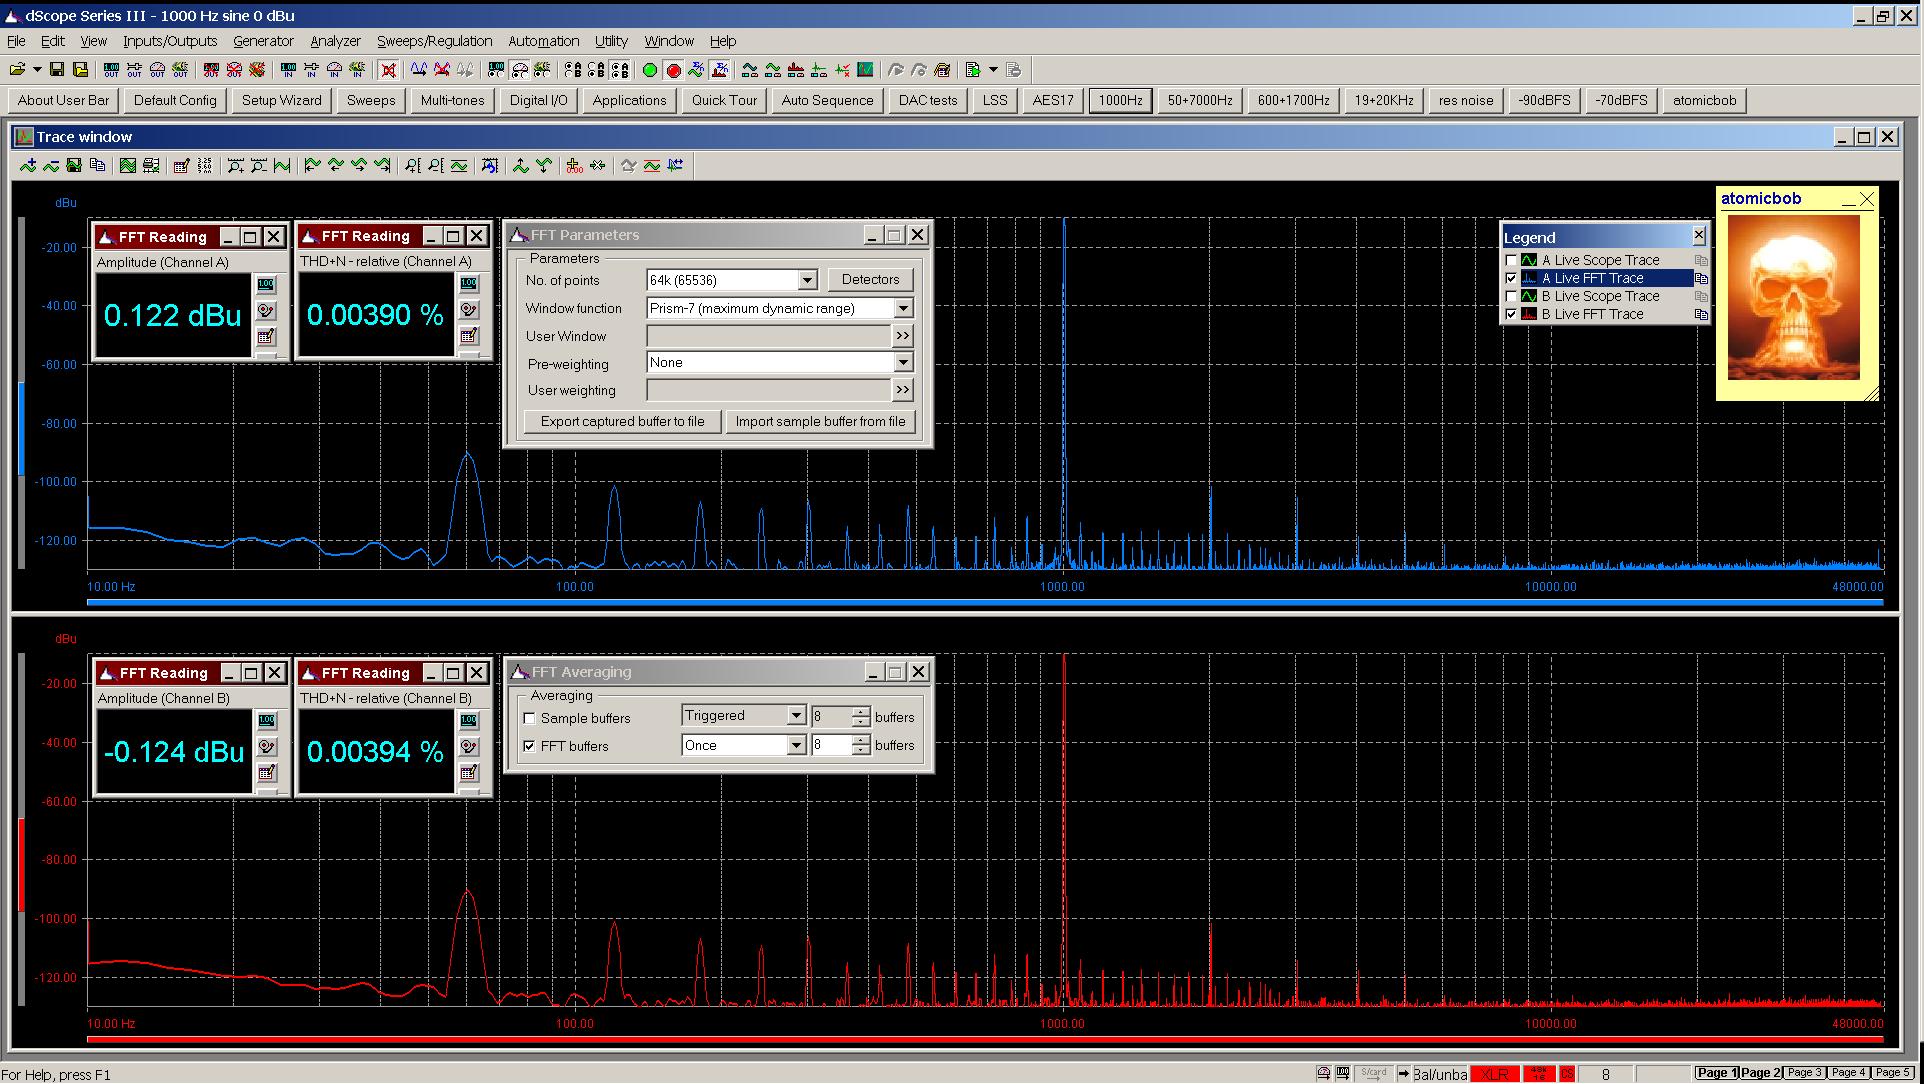 20181110-02 LiqPlat 1 KHz THD+N THD FFT 0dBu 30R SE-4XF - NoiseNuke.png